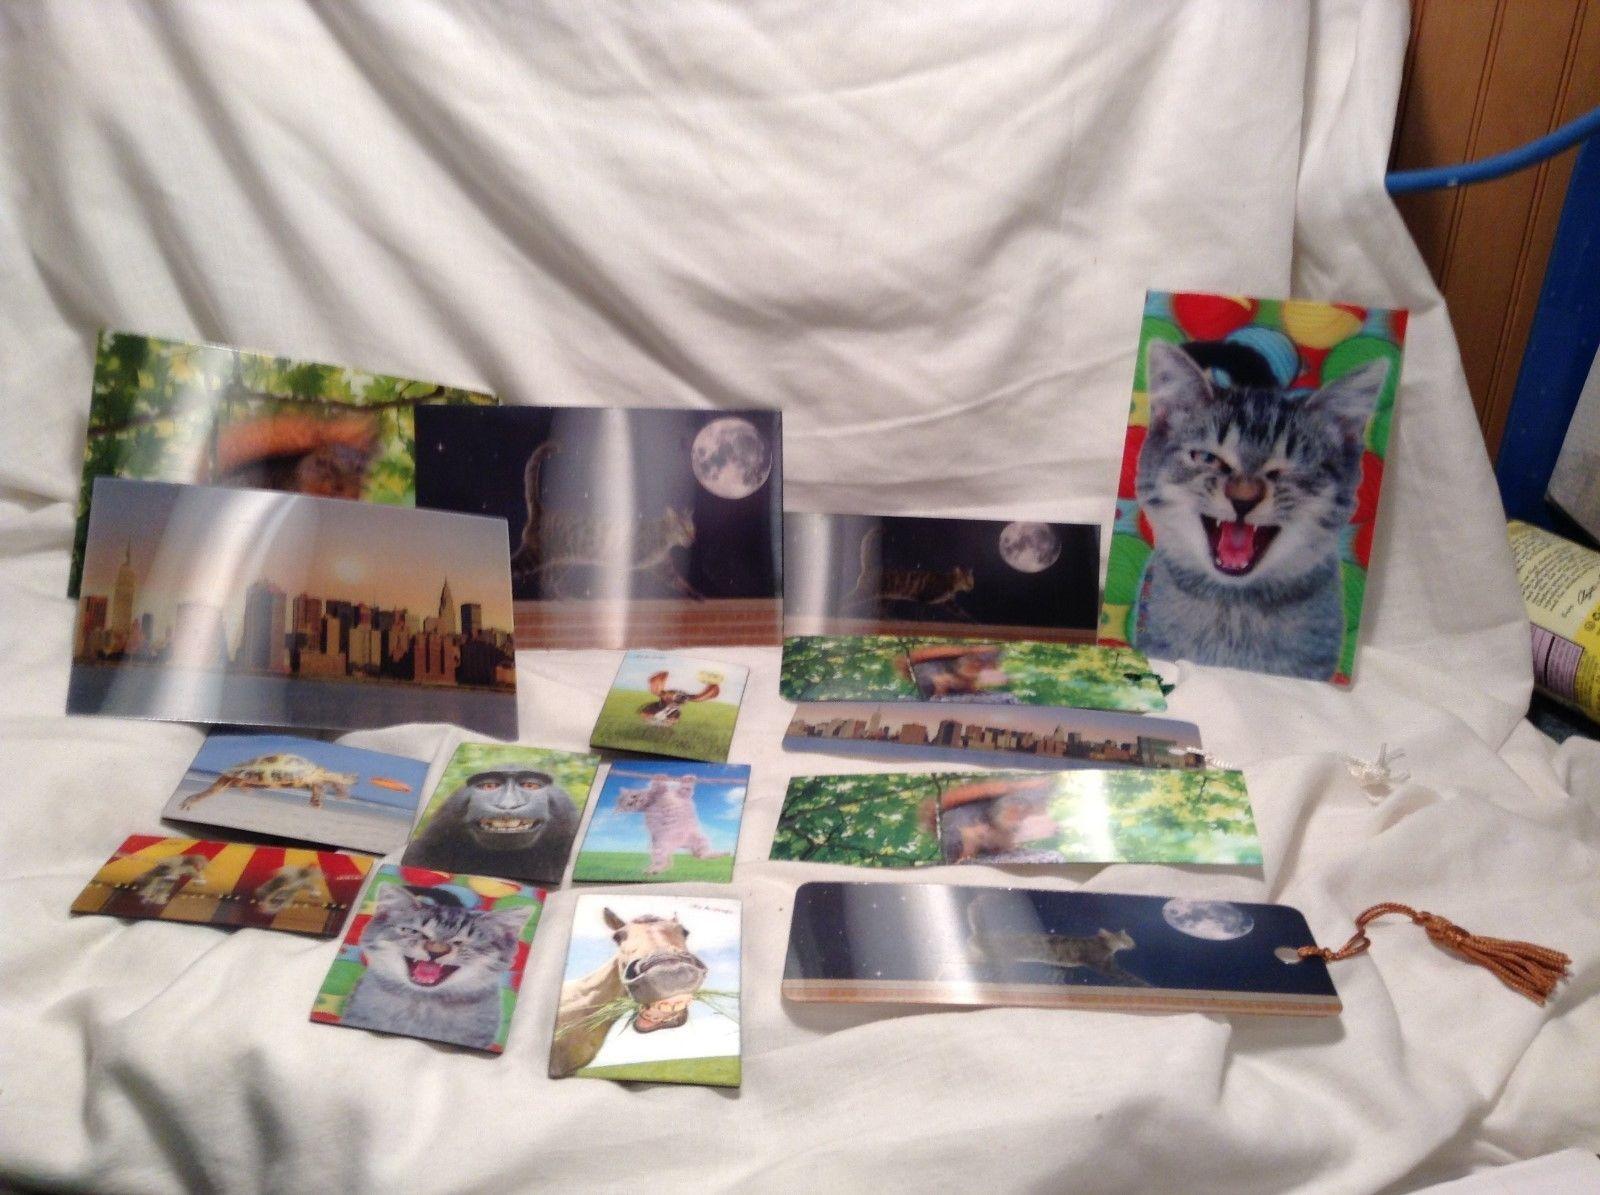 NEW Trenz Holographic Item Set of Magnets, Bookmarks & Postcards